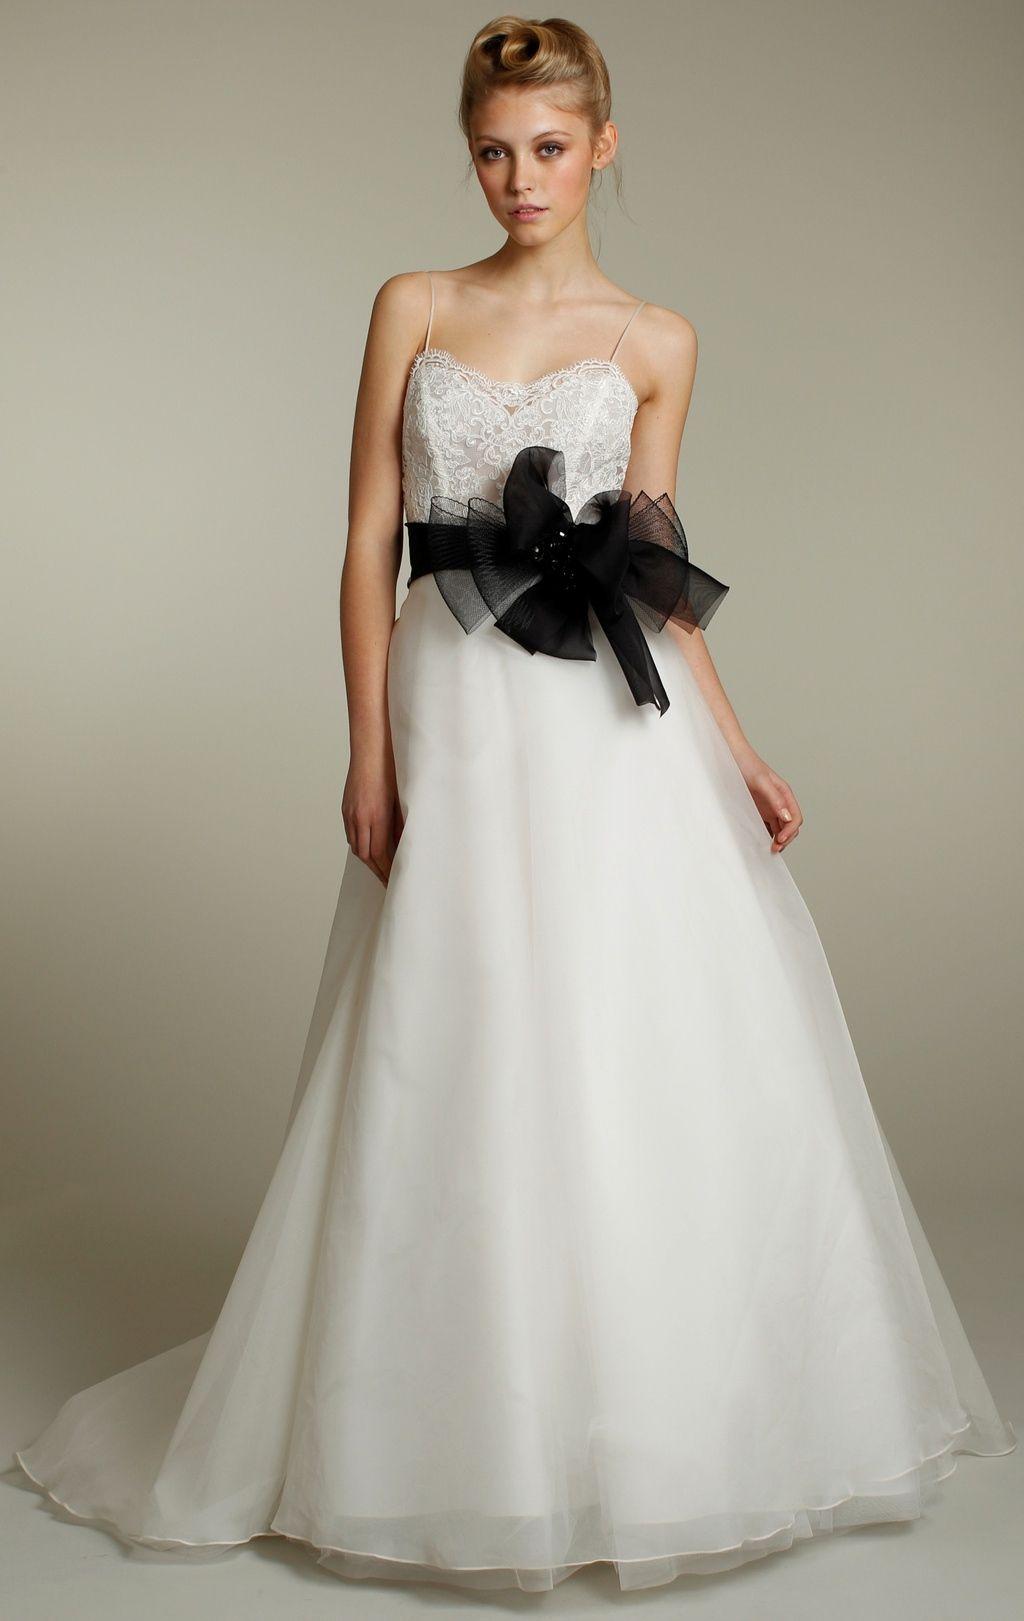 Black sashes for wedding dresses dresses for wedding reception